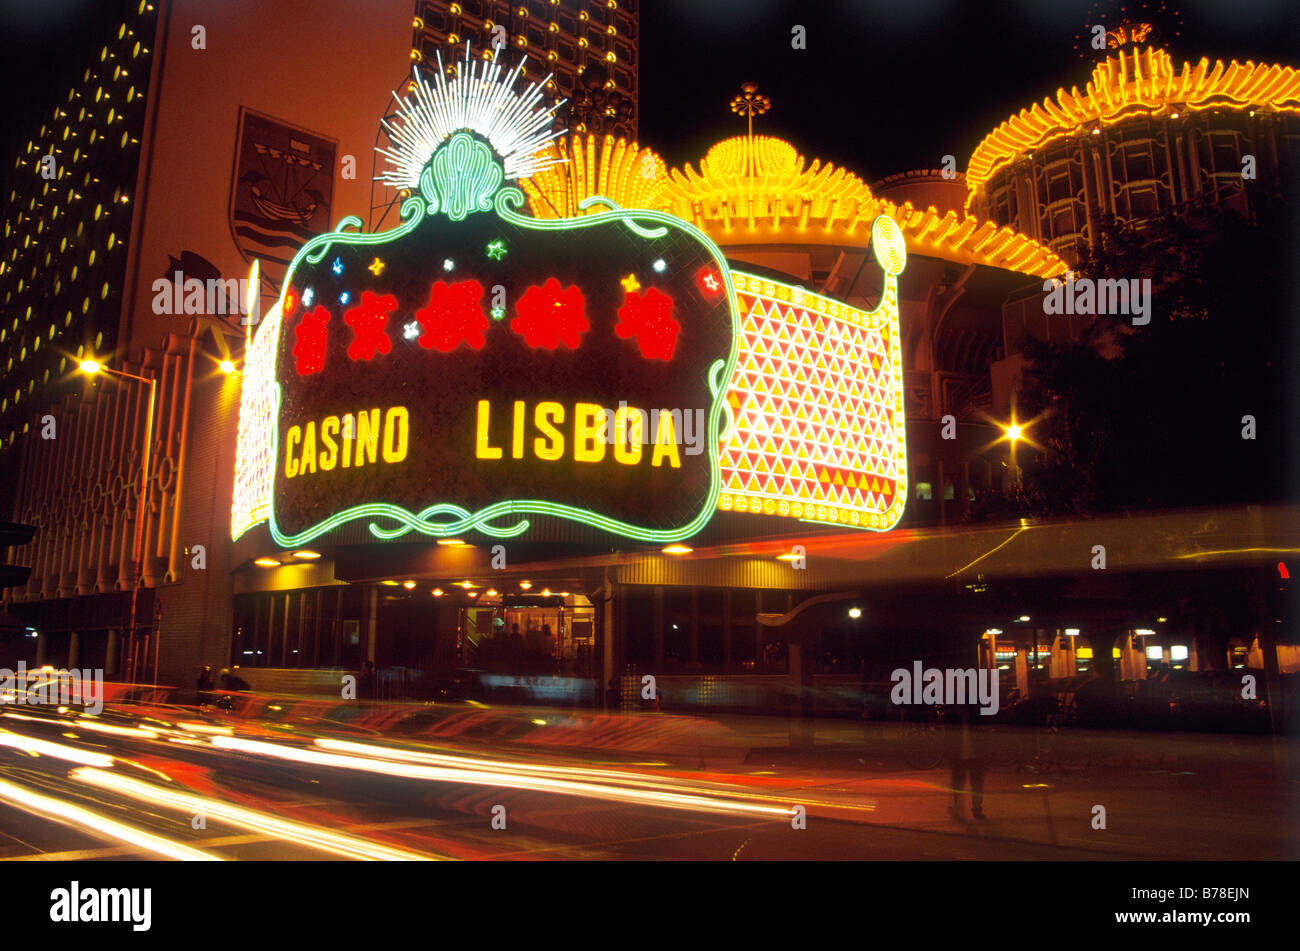 China,Macau,Casino Lisboa - Stock Image